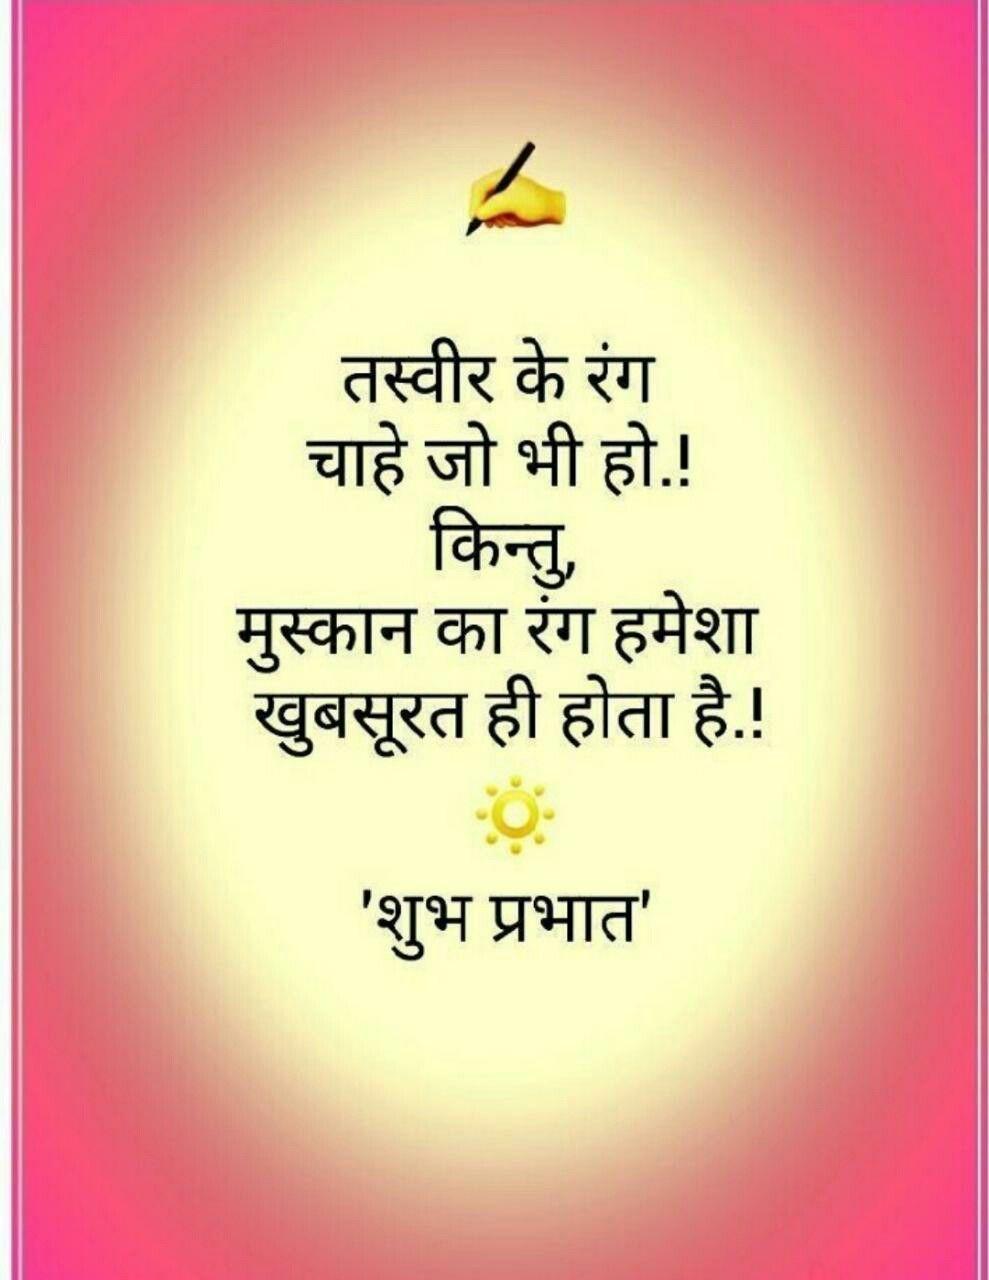 Pin by Sunita Makkar on Suprabhat | Good morning quotes